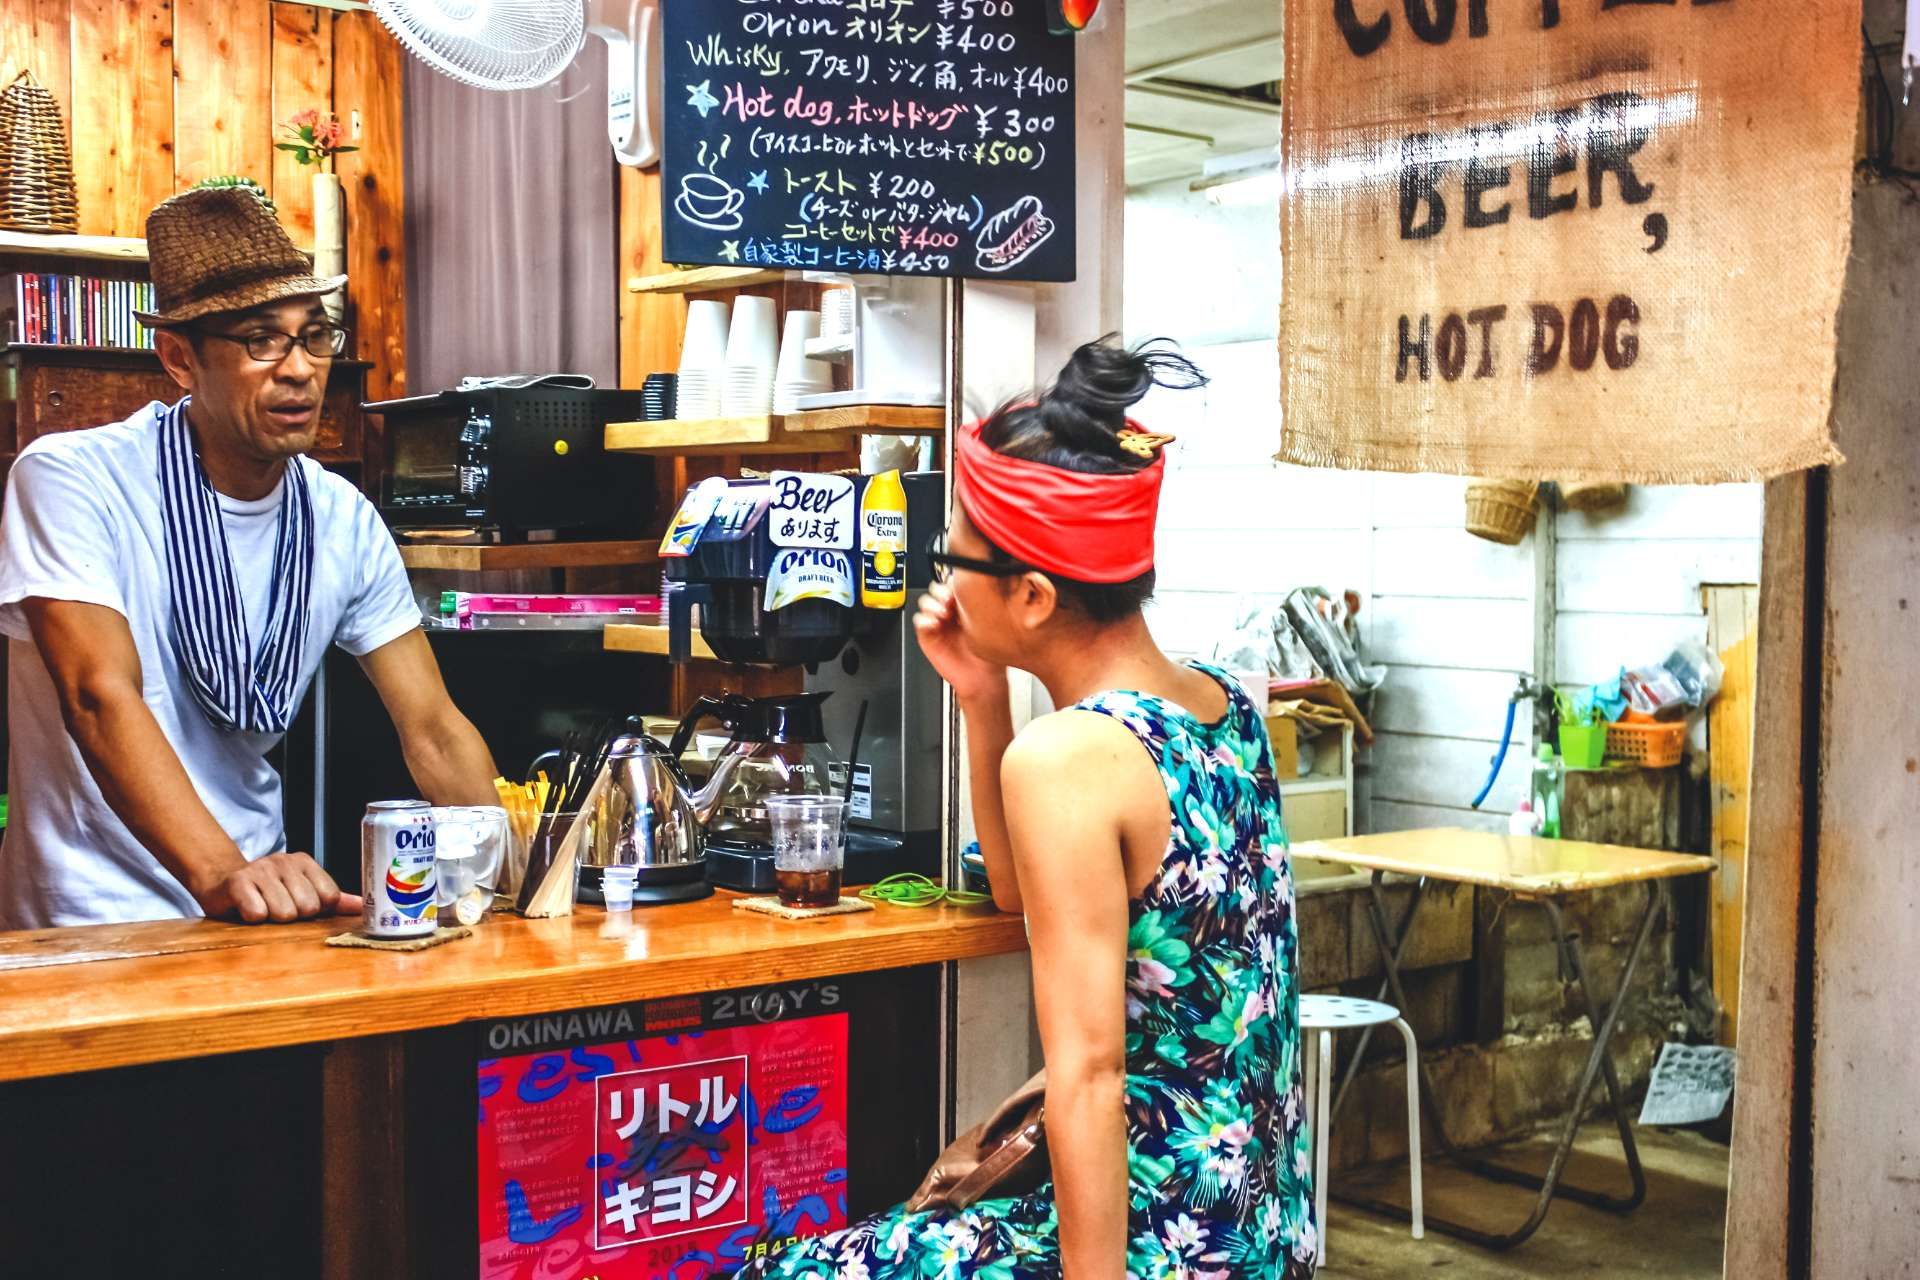 Okinawa Japan Parasol Cafe